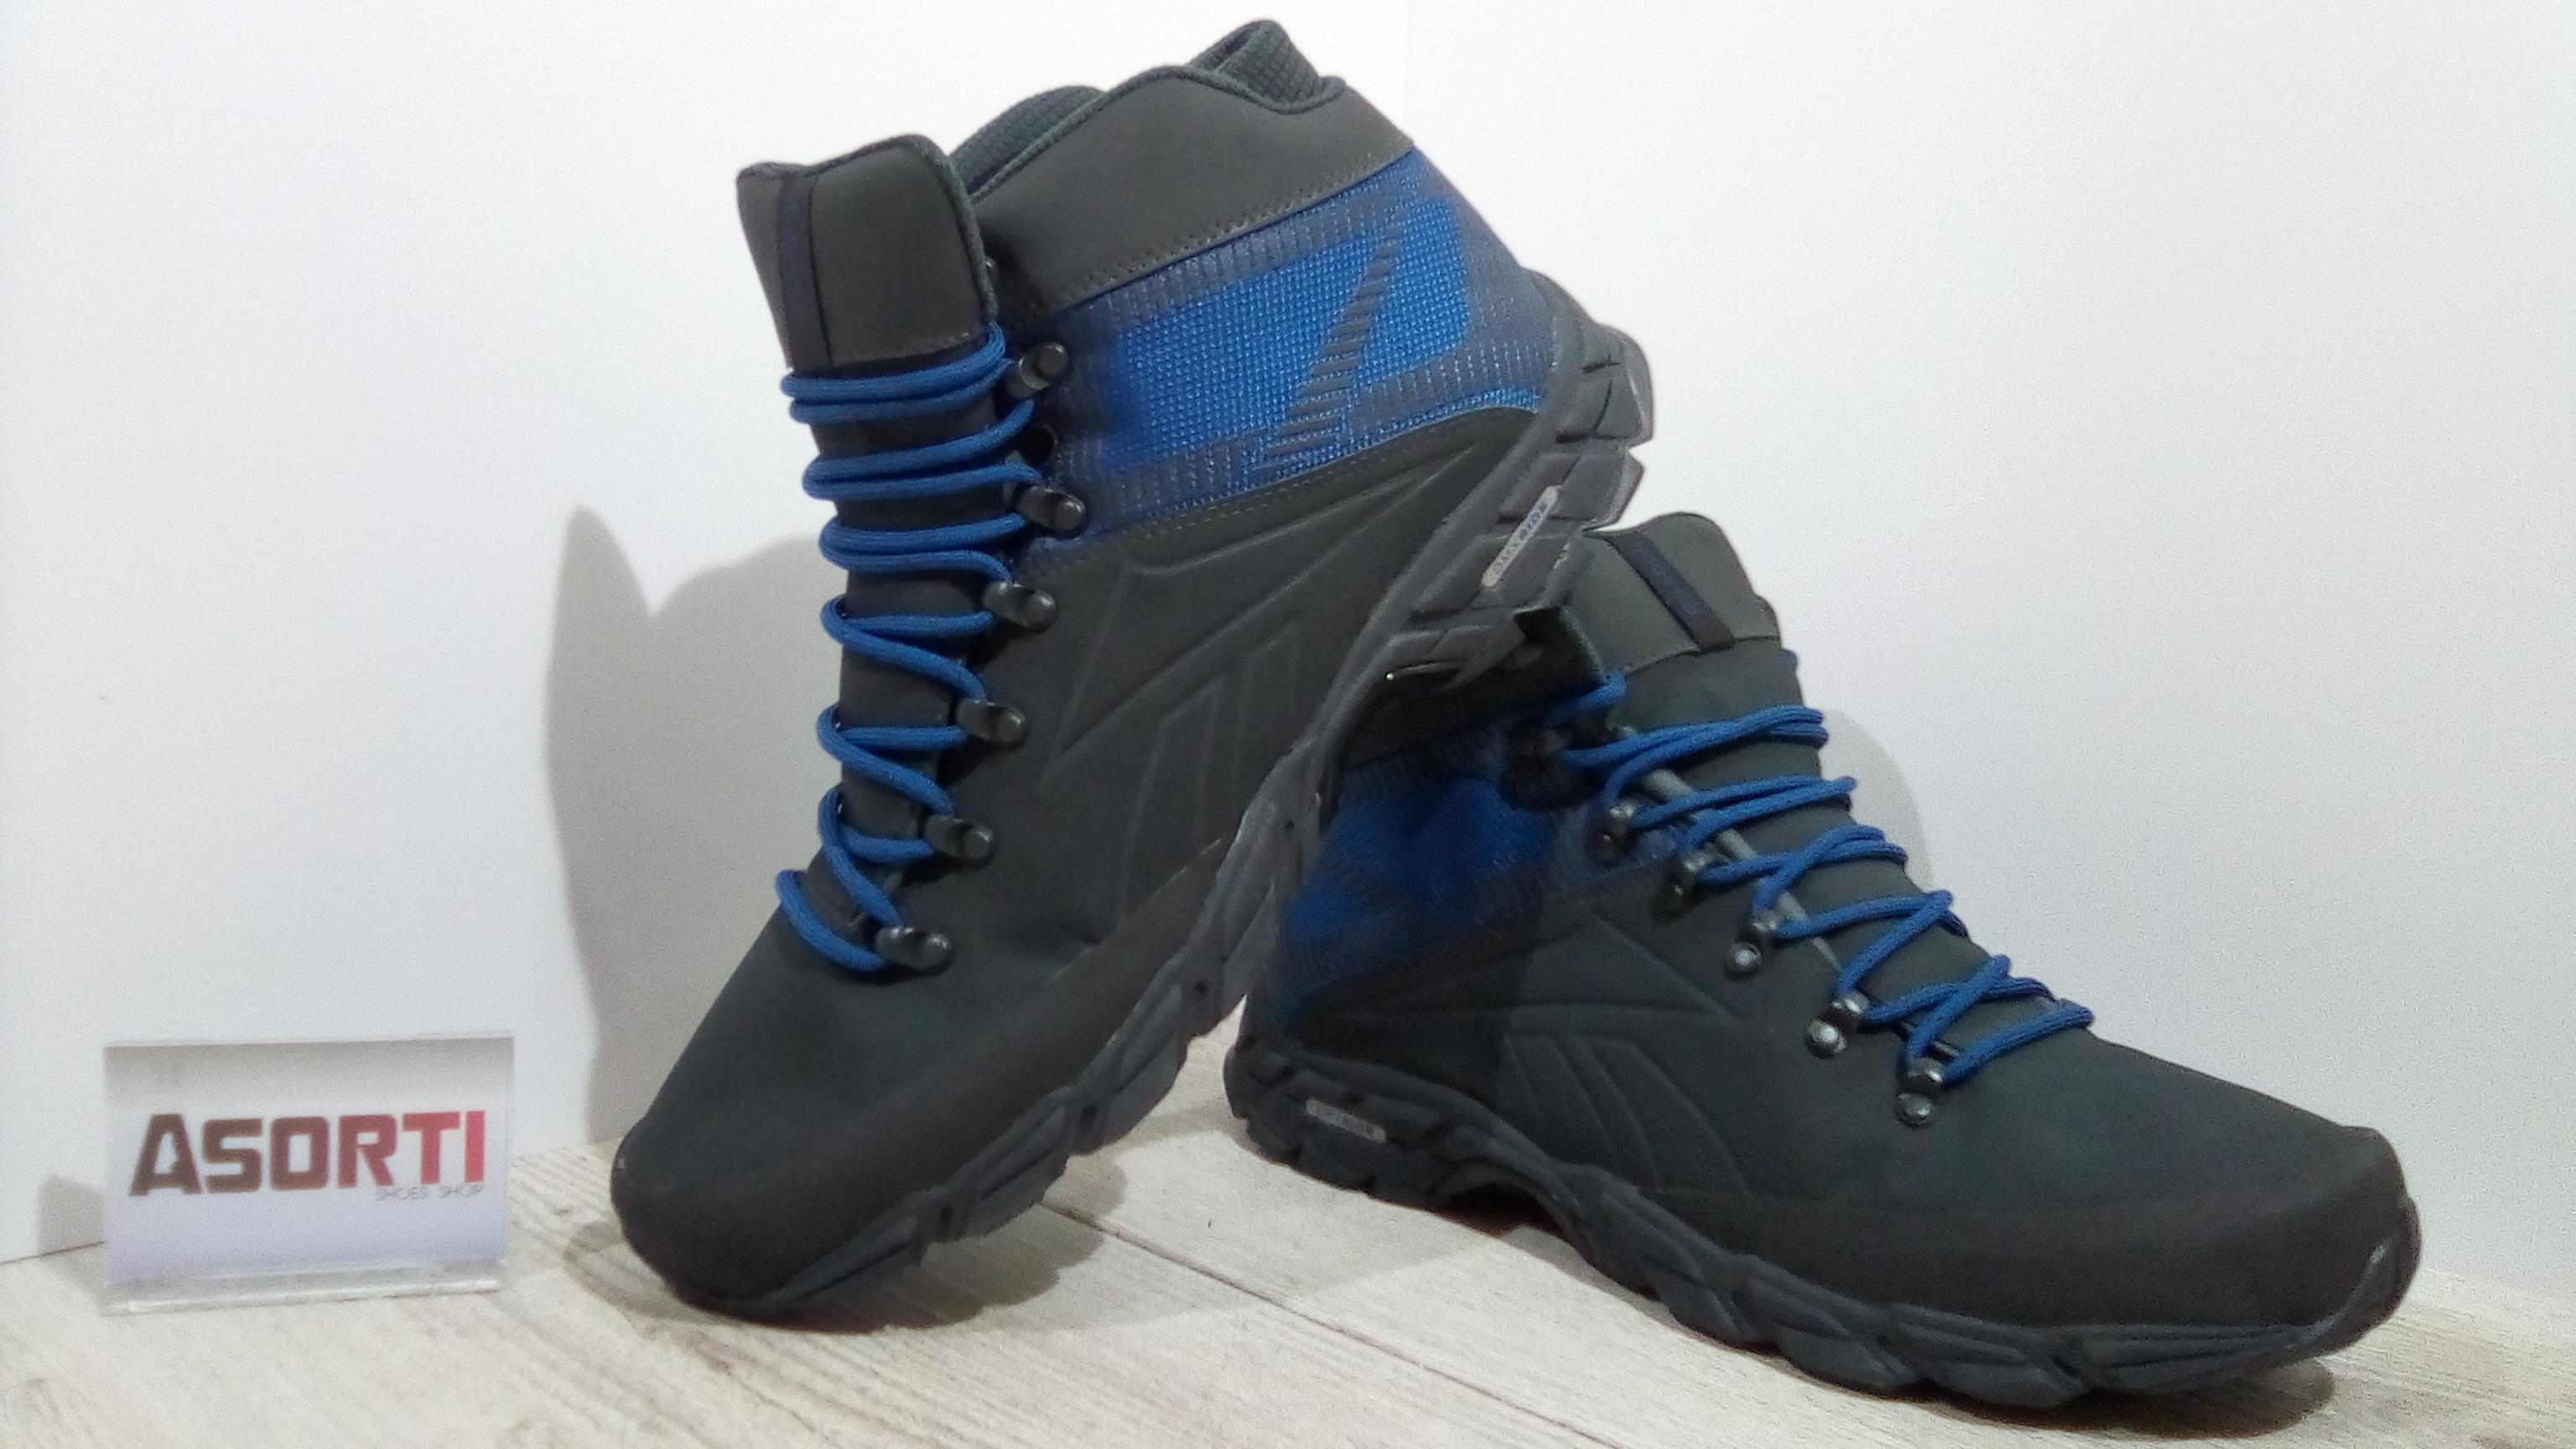 d9338d1e Мужские утепленные кроссовки Reebok Trailchaser MID (V70807) черные ...